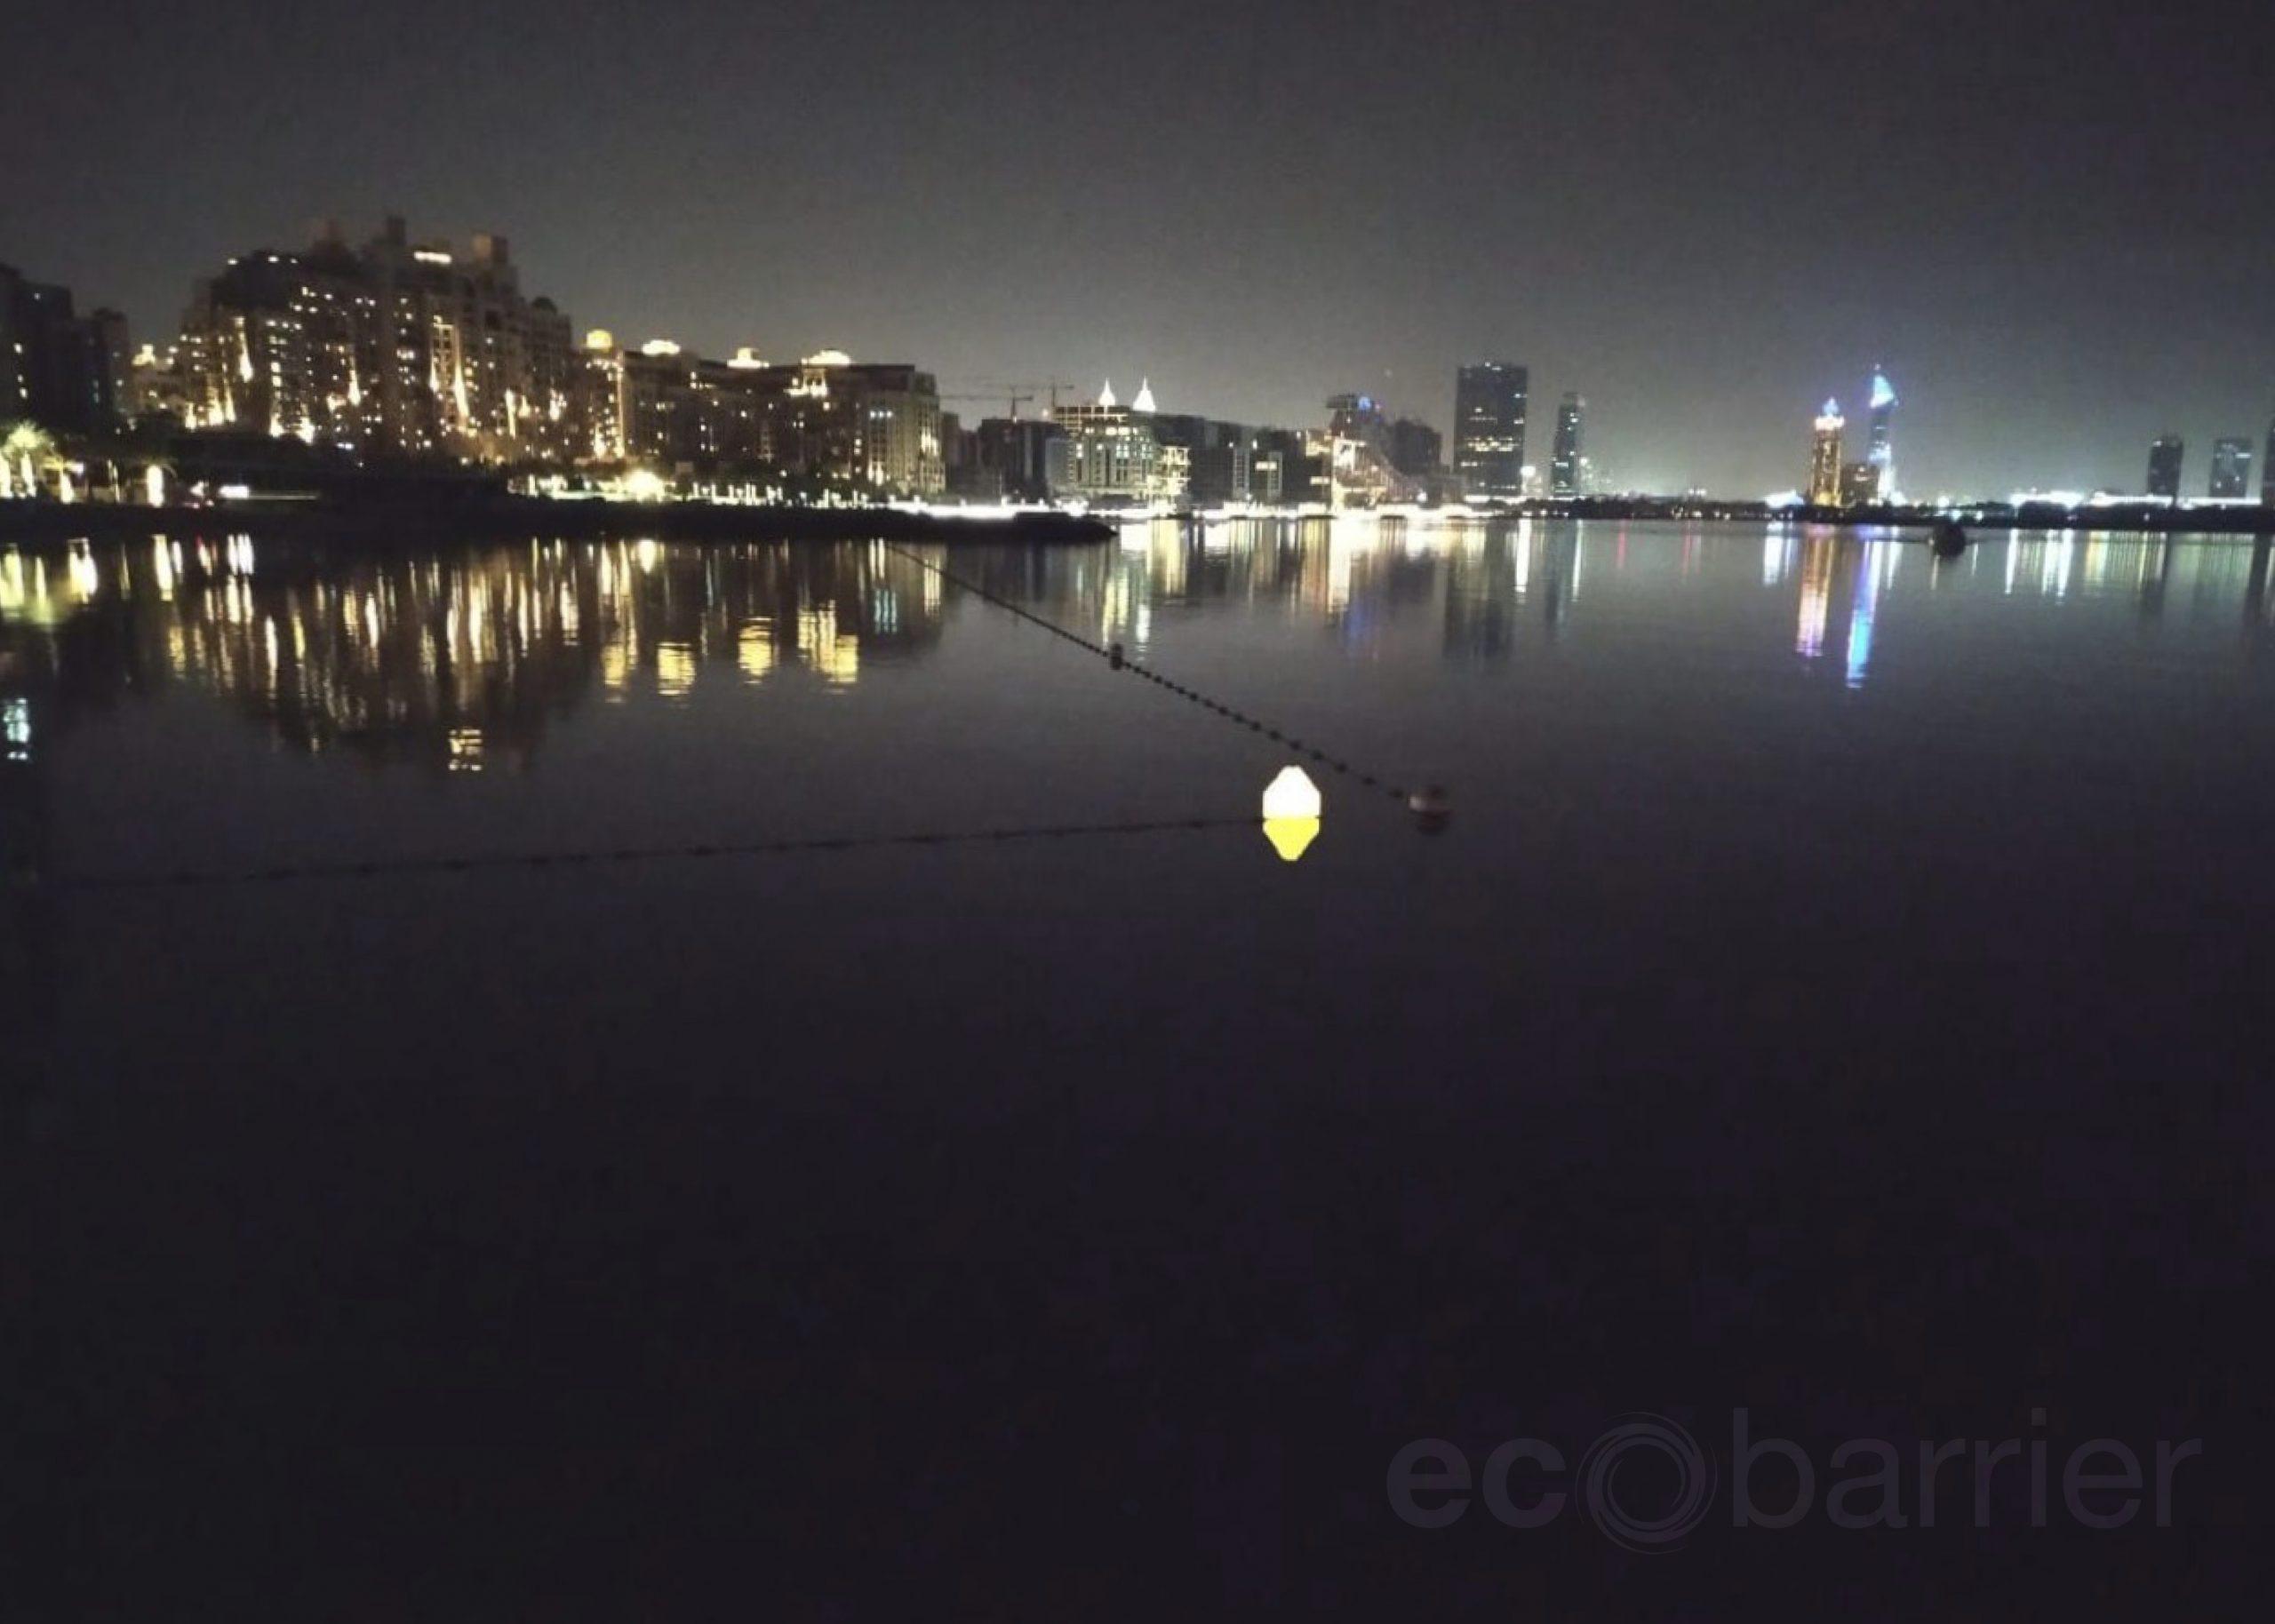 Ecobarrier Light Buoys ELB-650